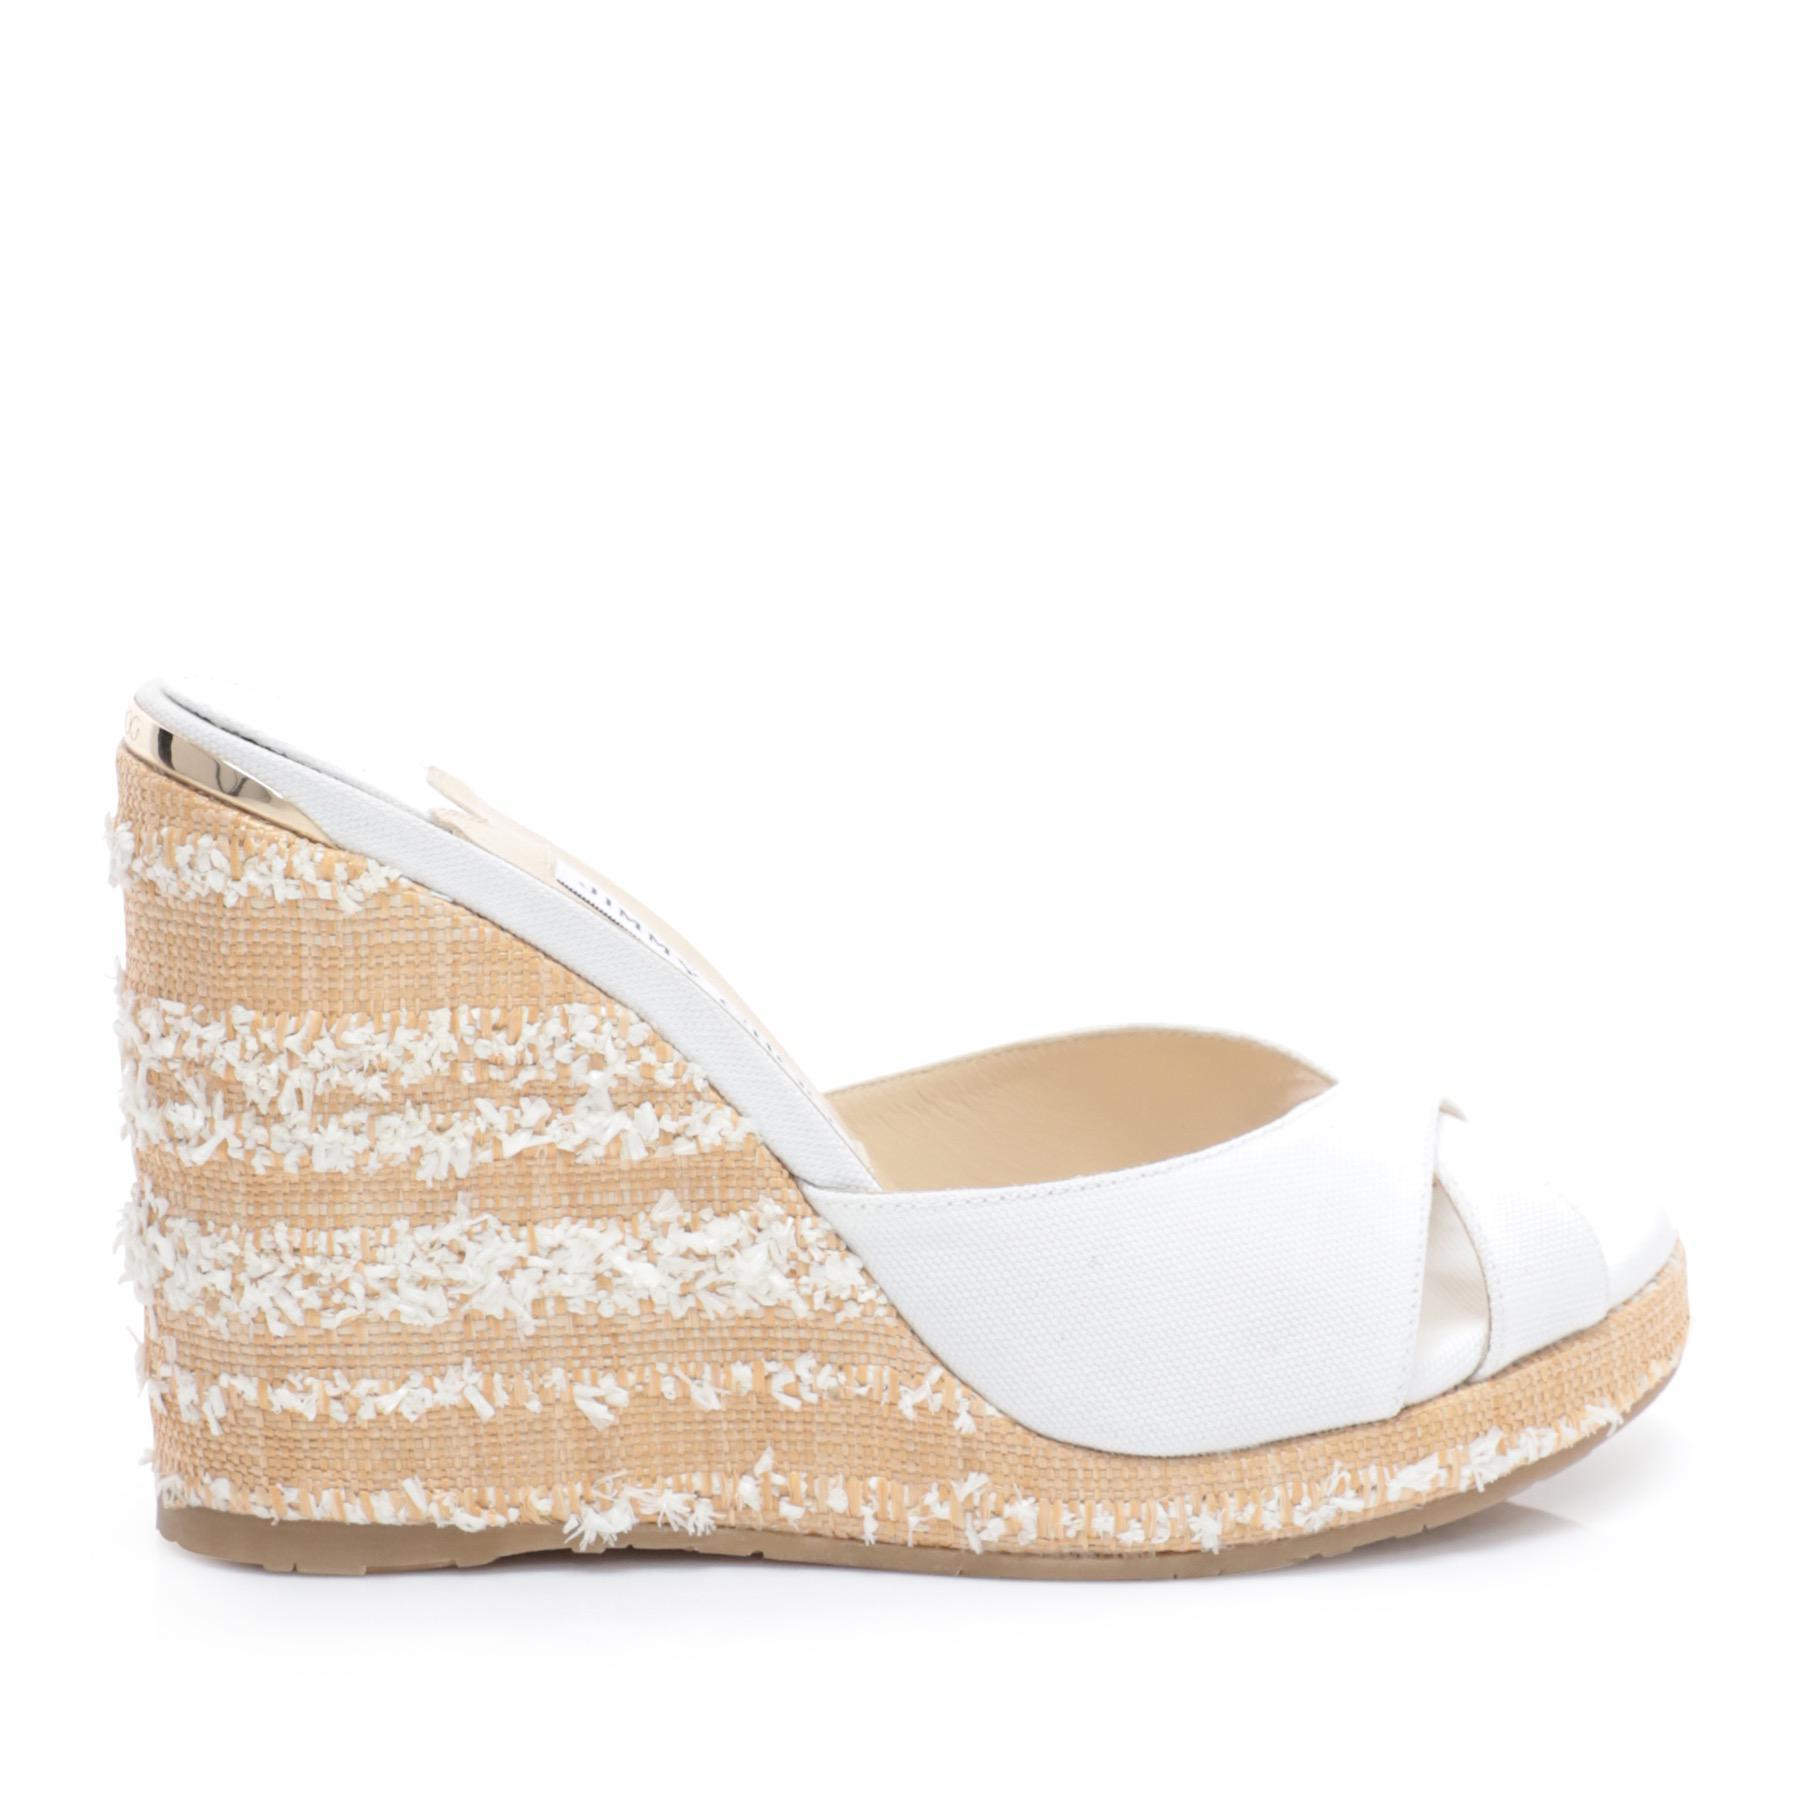 bf2124587c1 Lyst - Jimmy Choo Almer Wedge Sandals in White